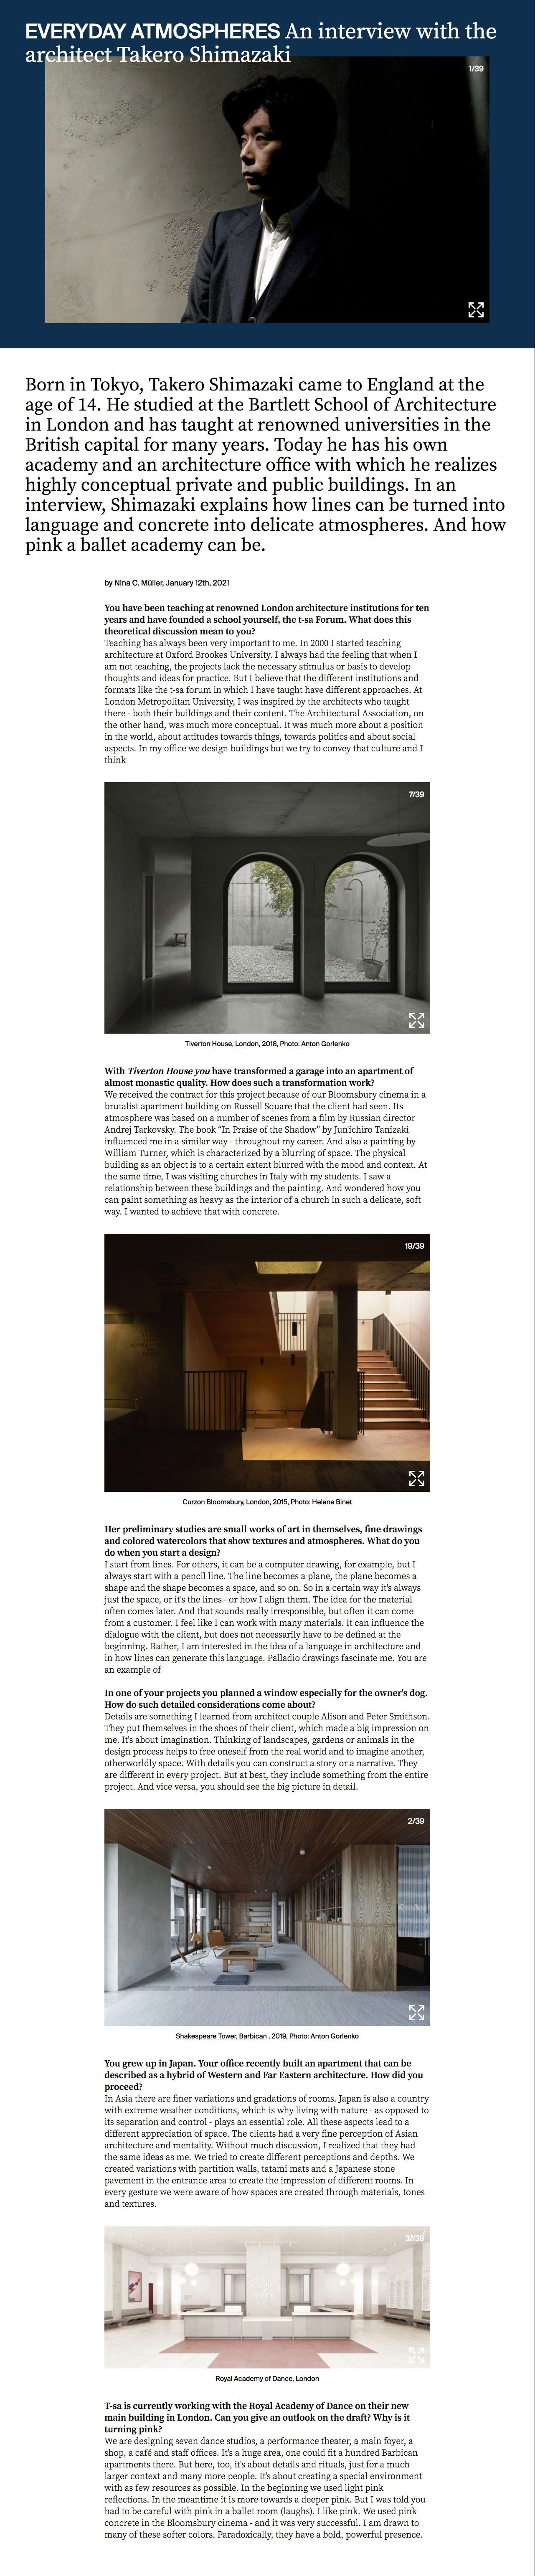 Everyday atmospheres - people - baunetz interior design (1) copy